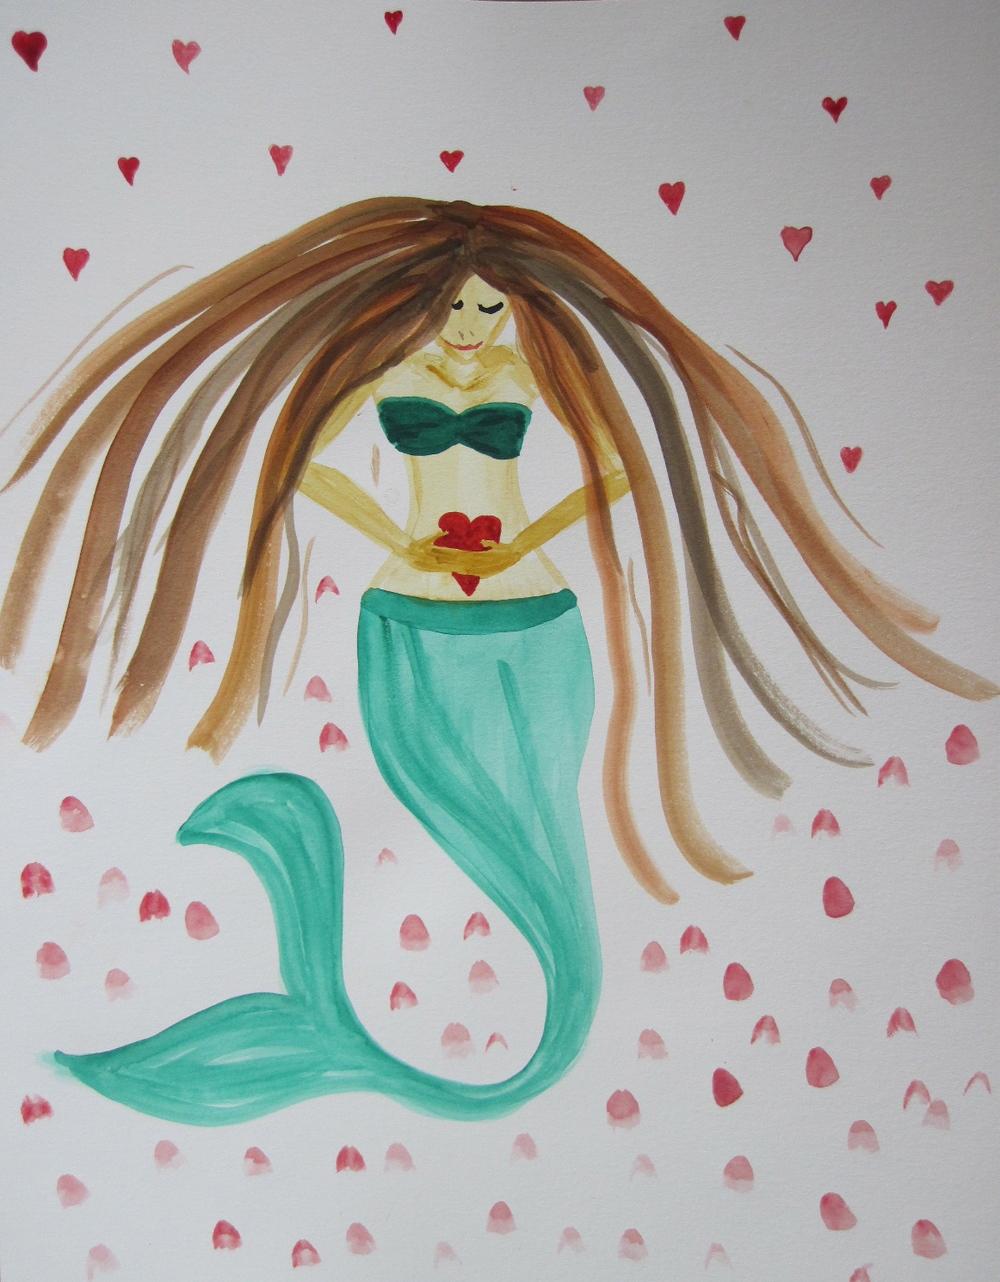 Full of love mermaid